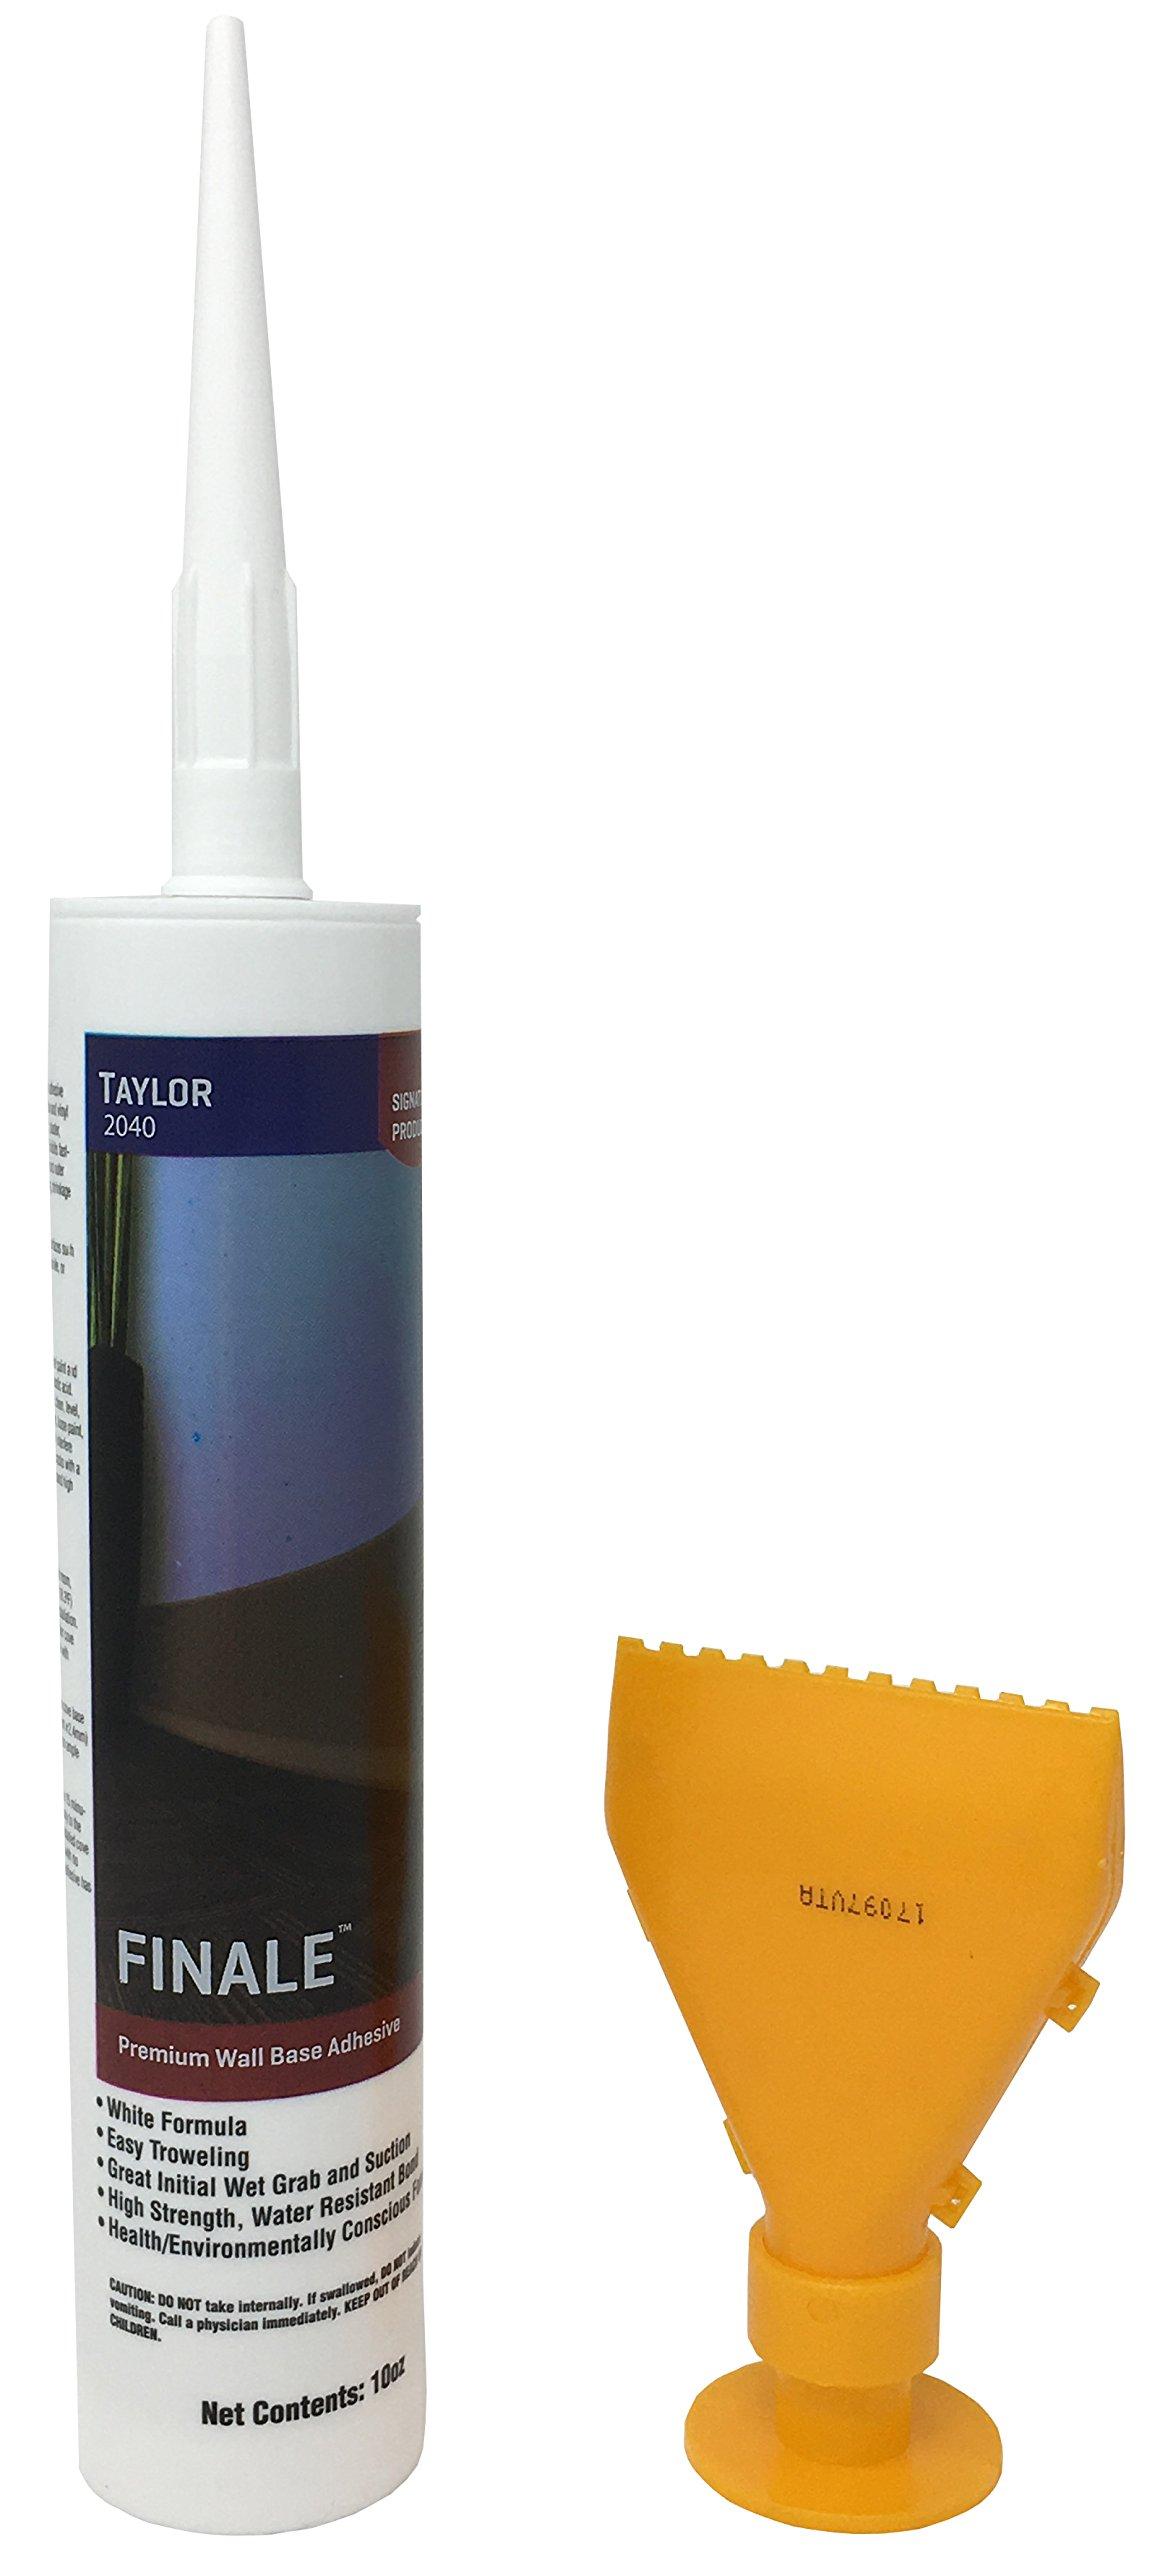 Cove Base Adhesive With Reusable Spreader Nozzle - Taylor 2040 Premium Wall Base Adhesive - High Strength Cove Base Glue 10oz. Tube - White Hard-Setting Acrylic Adhesive For Cove Base